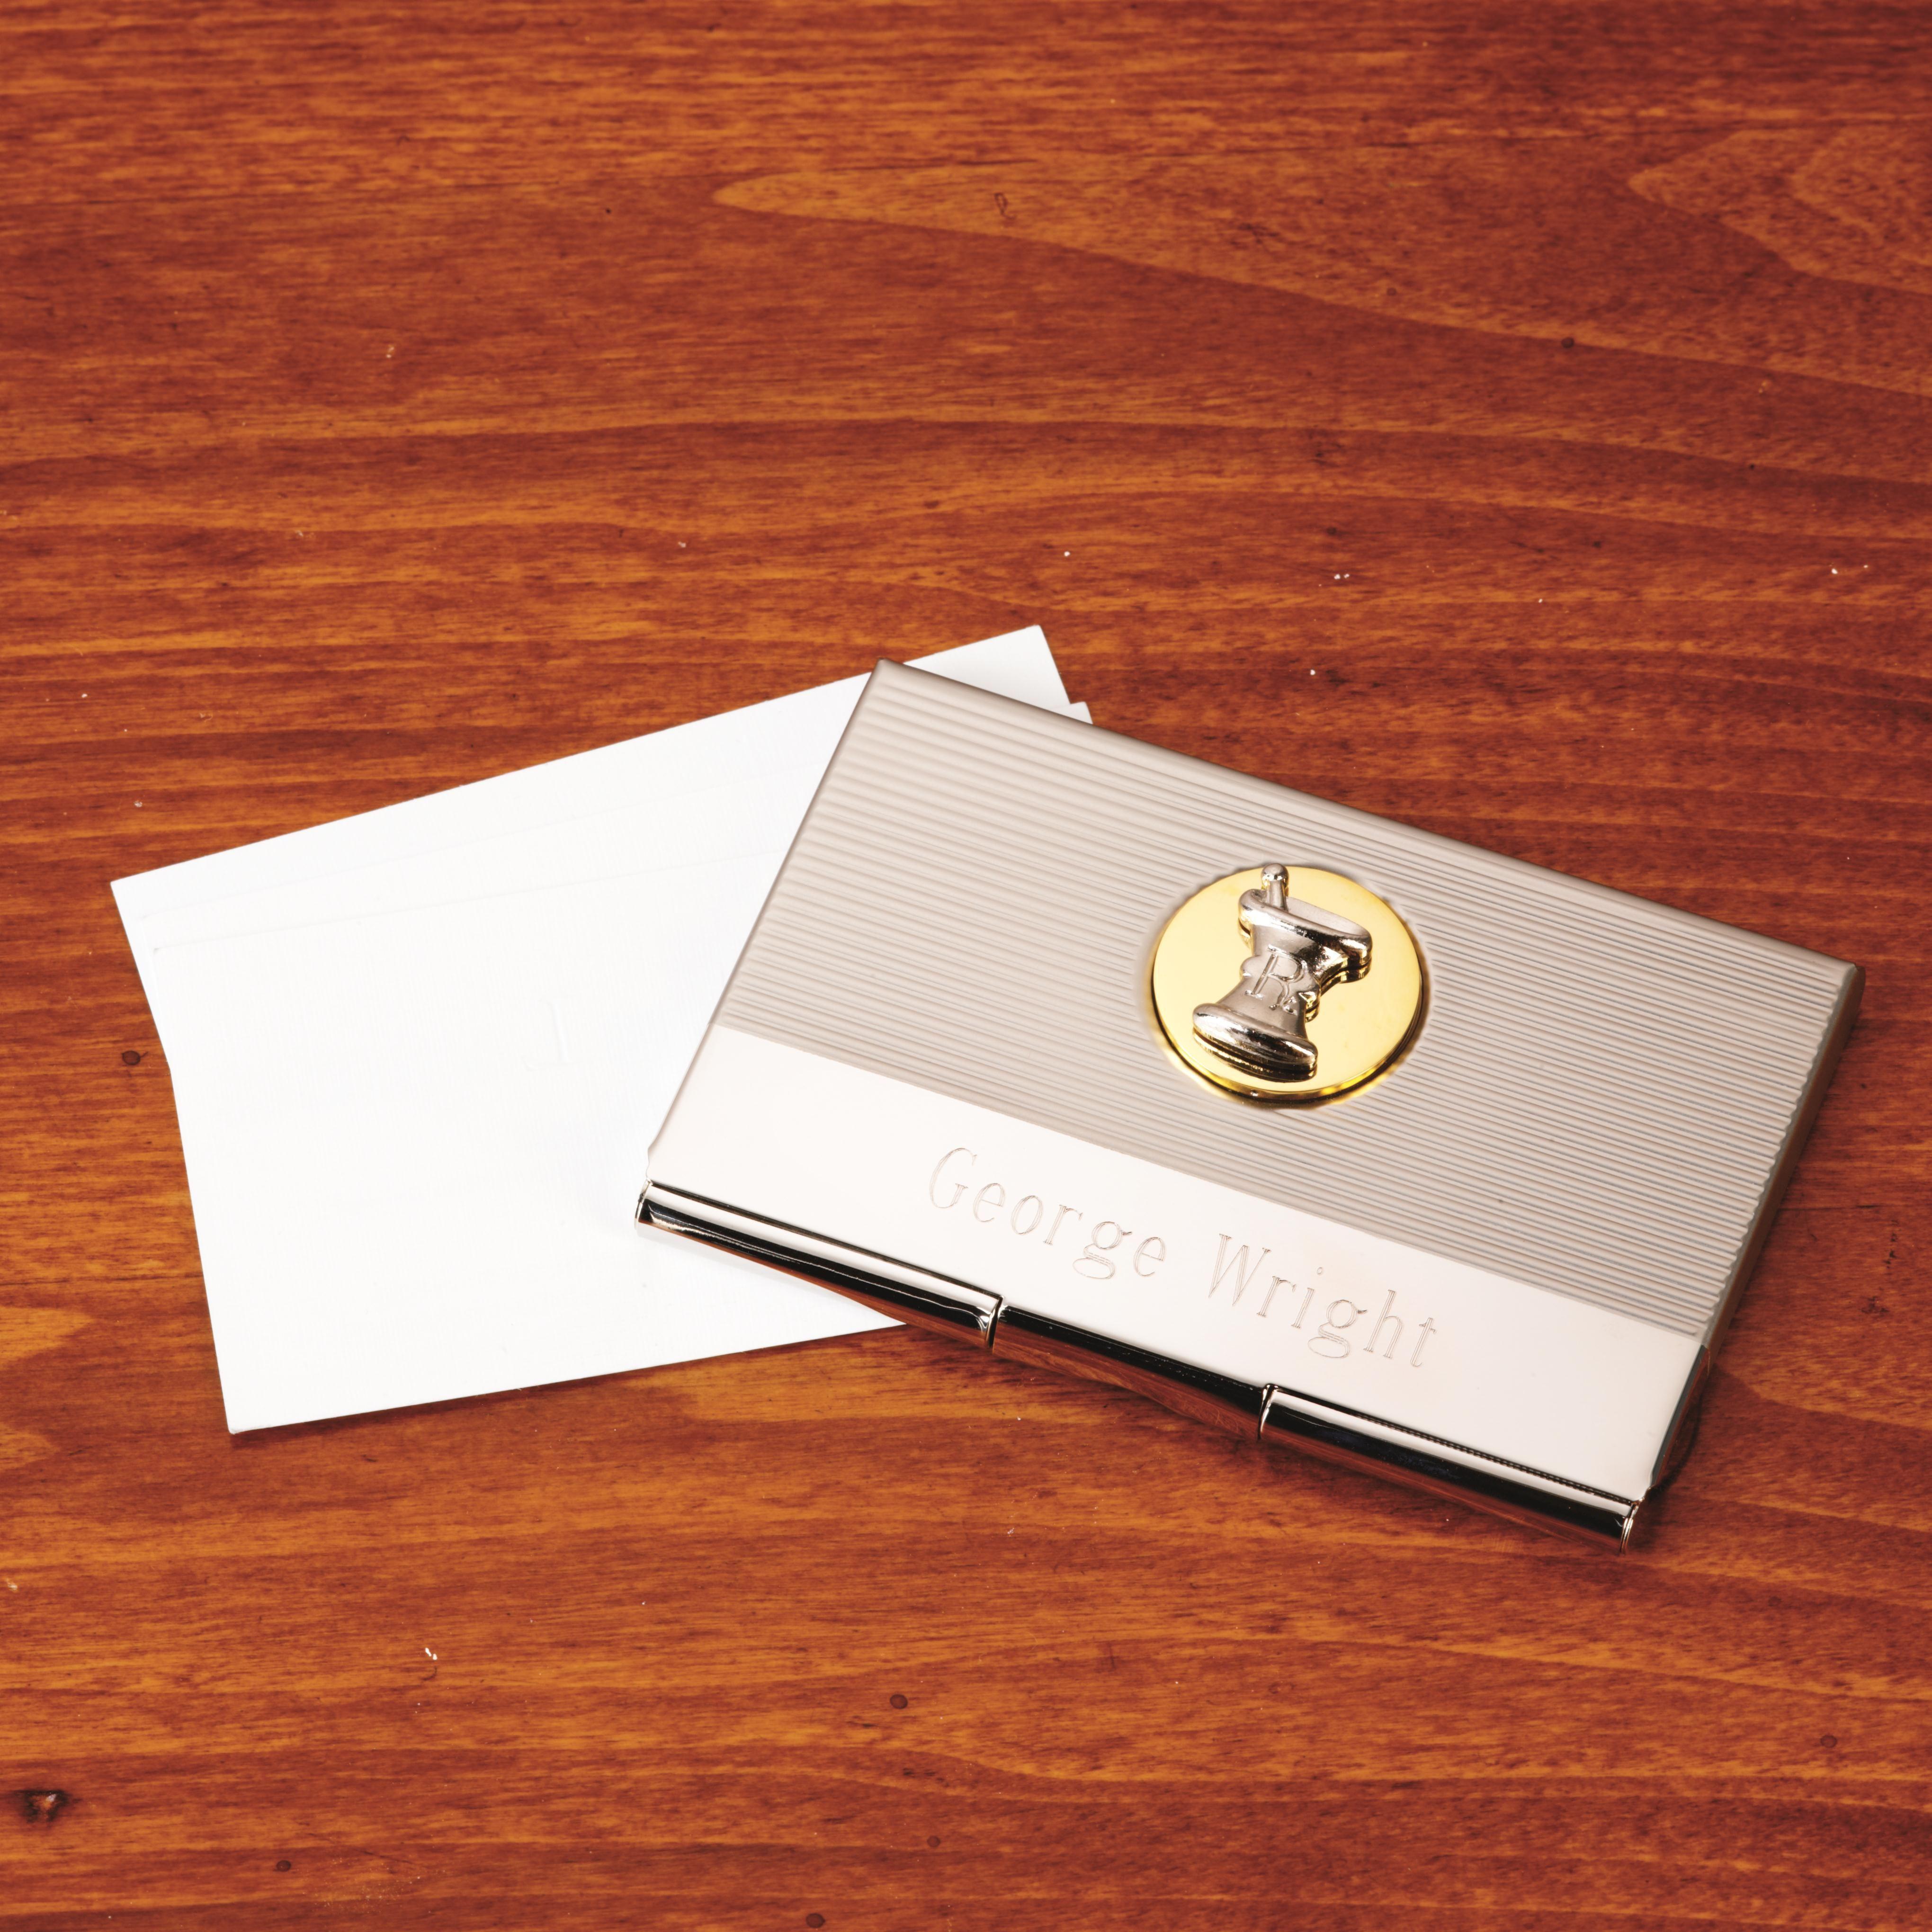 Mortar & pestle business card holder | Thank You Ideas | Pinterest ...